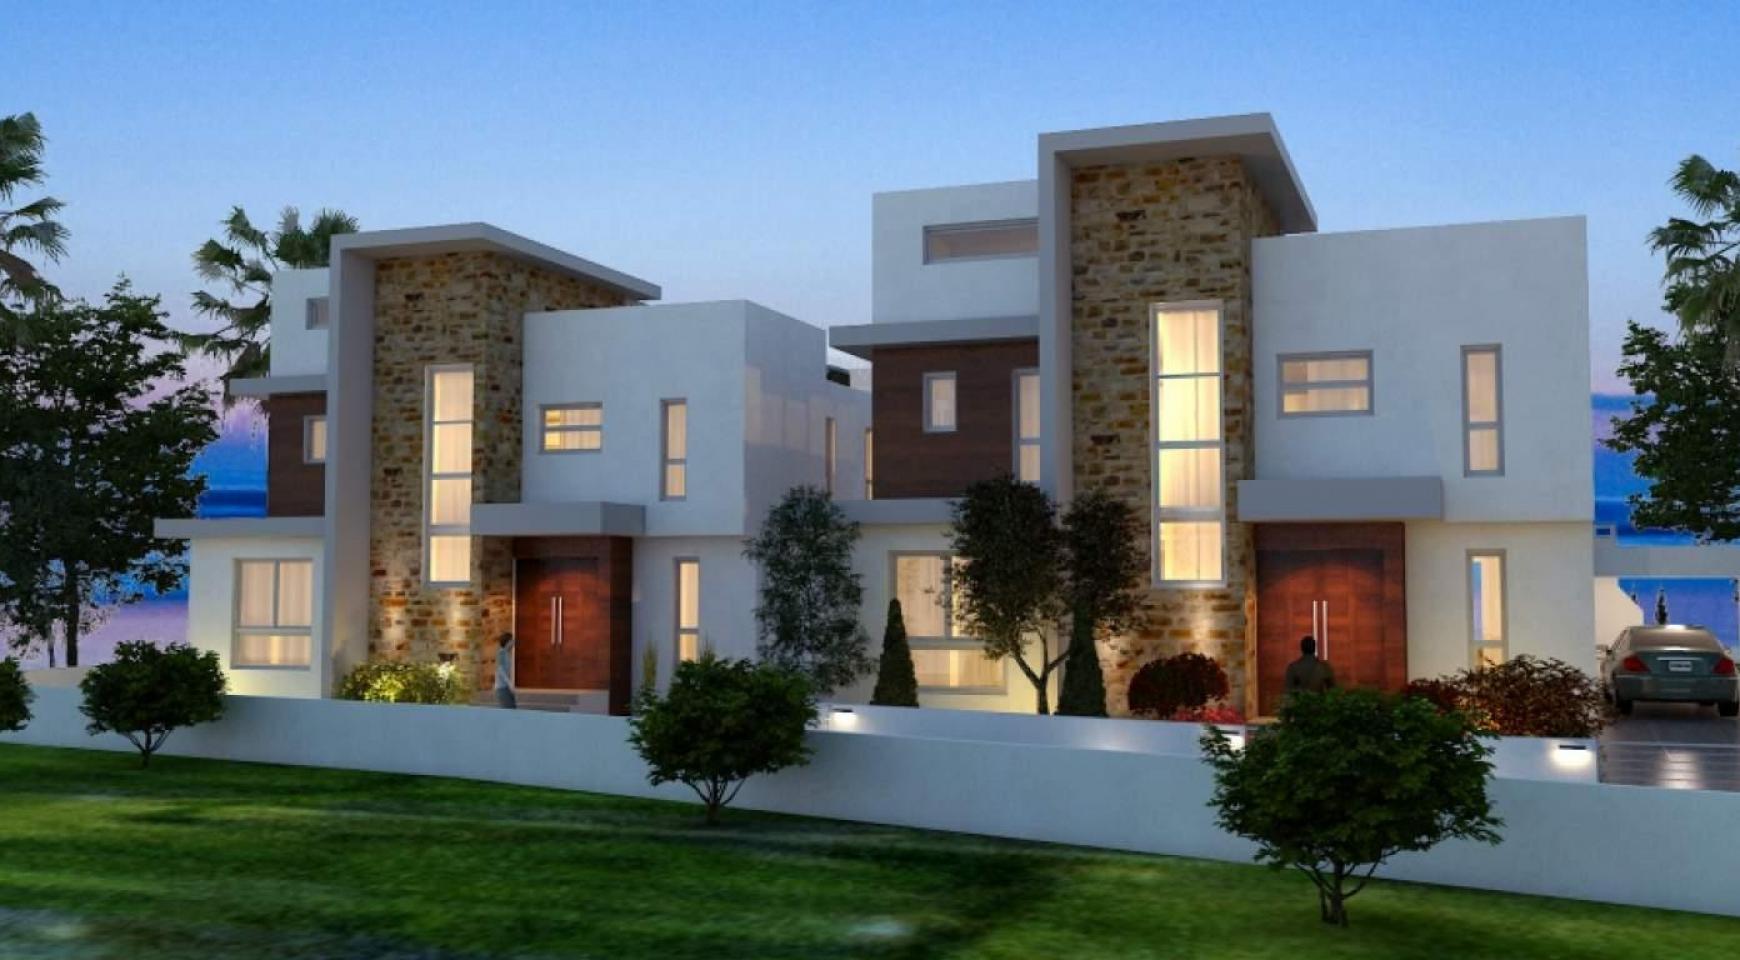 Contemporary Beachfront Villa with 5 Bedrooms - 3